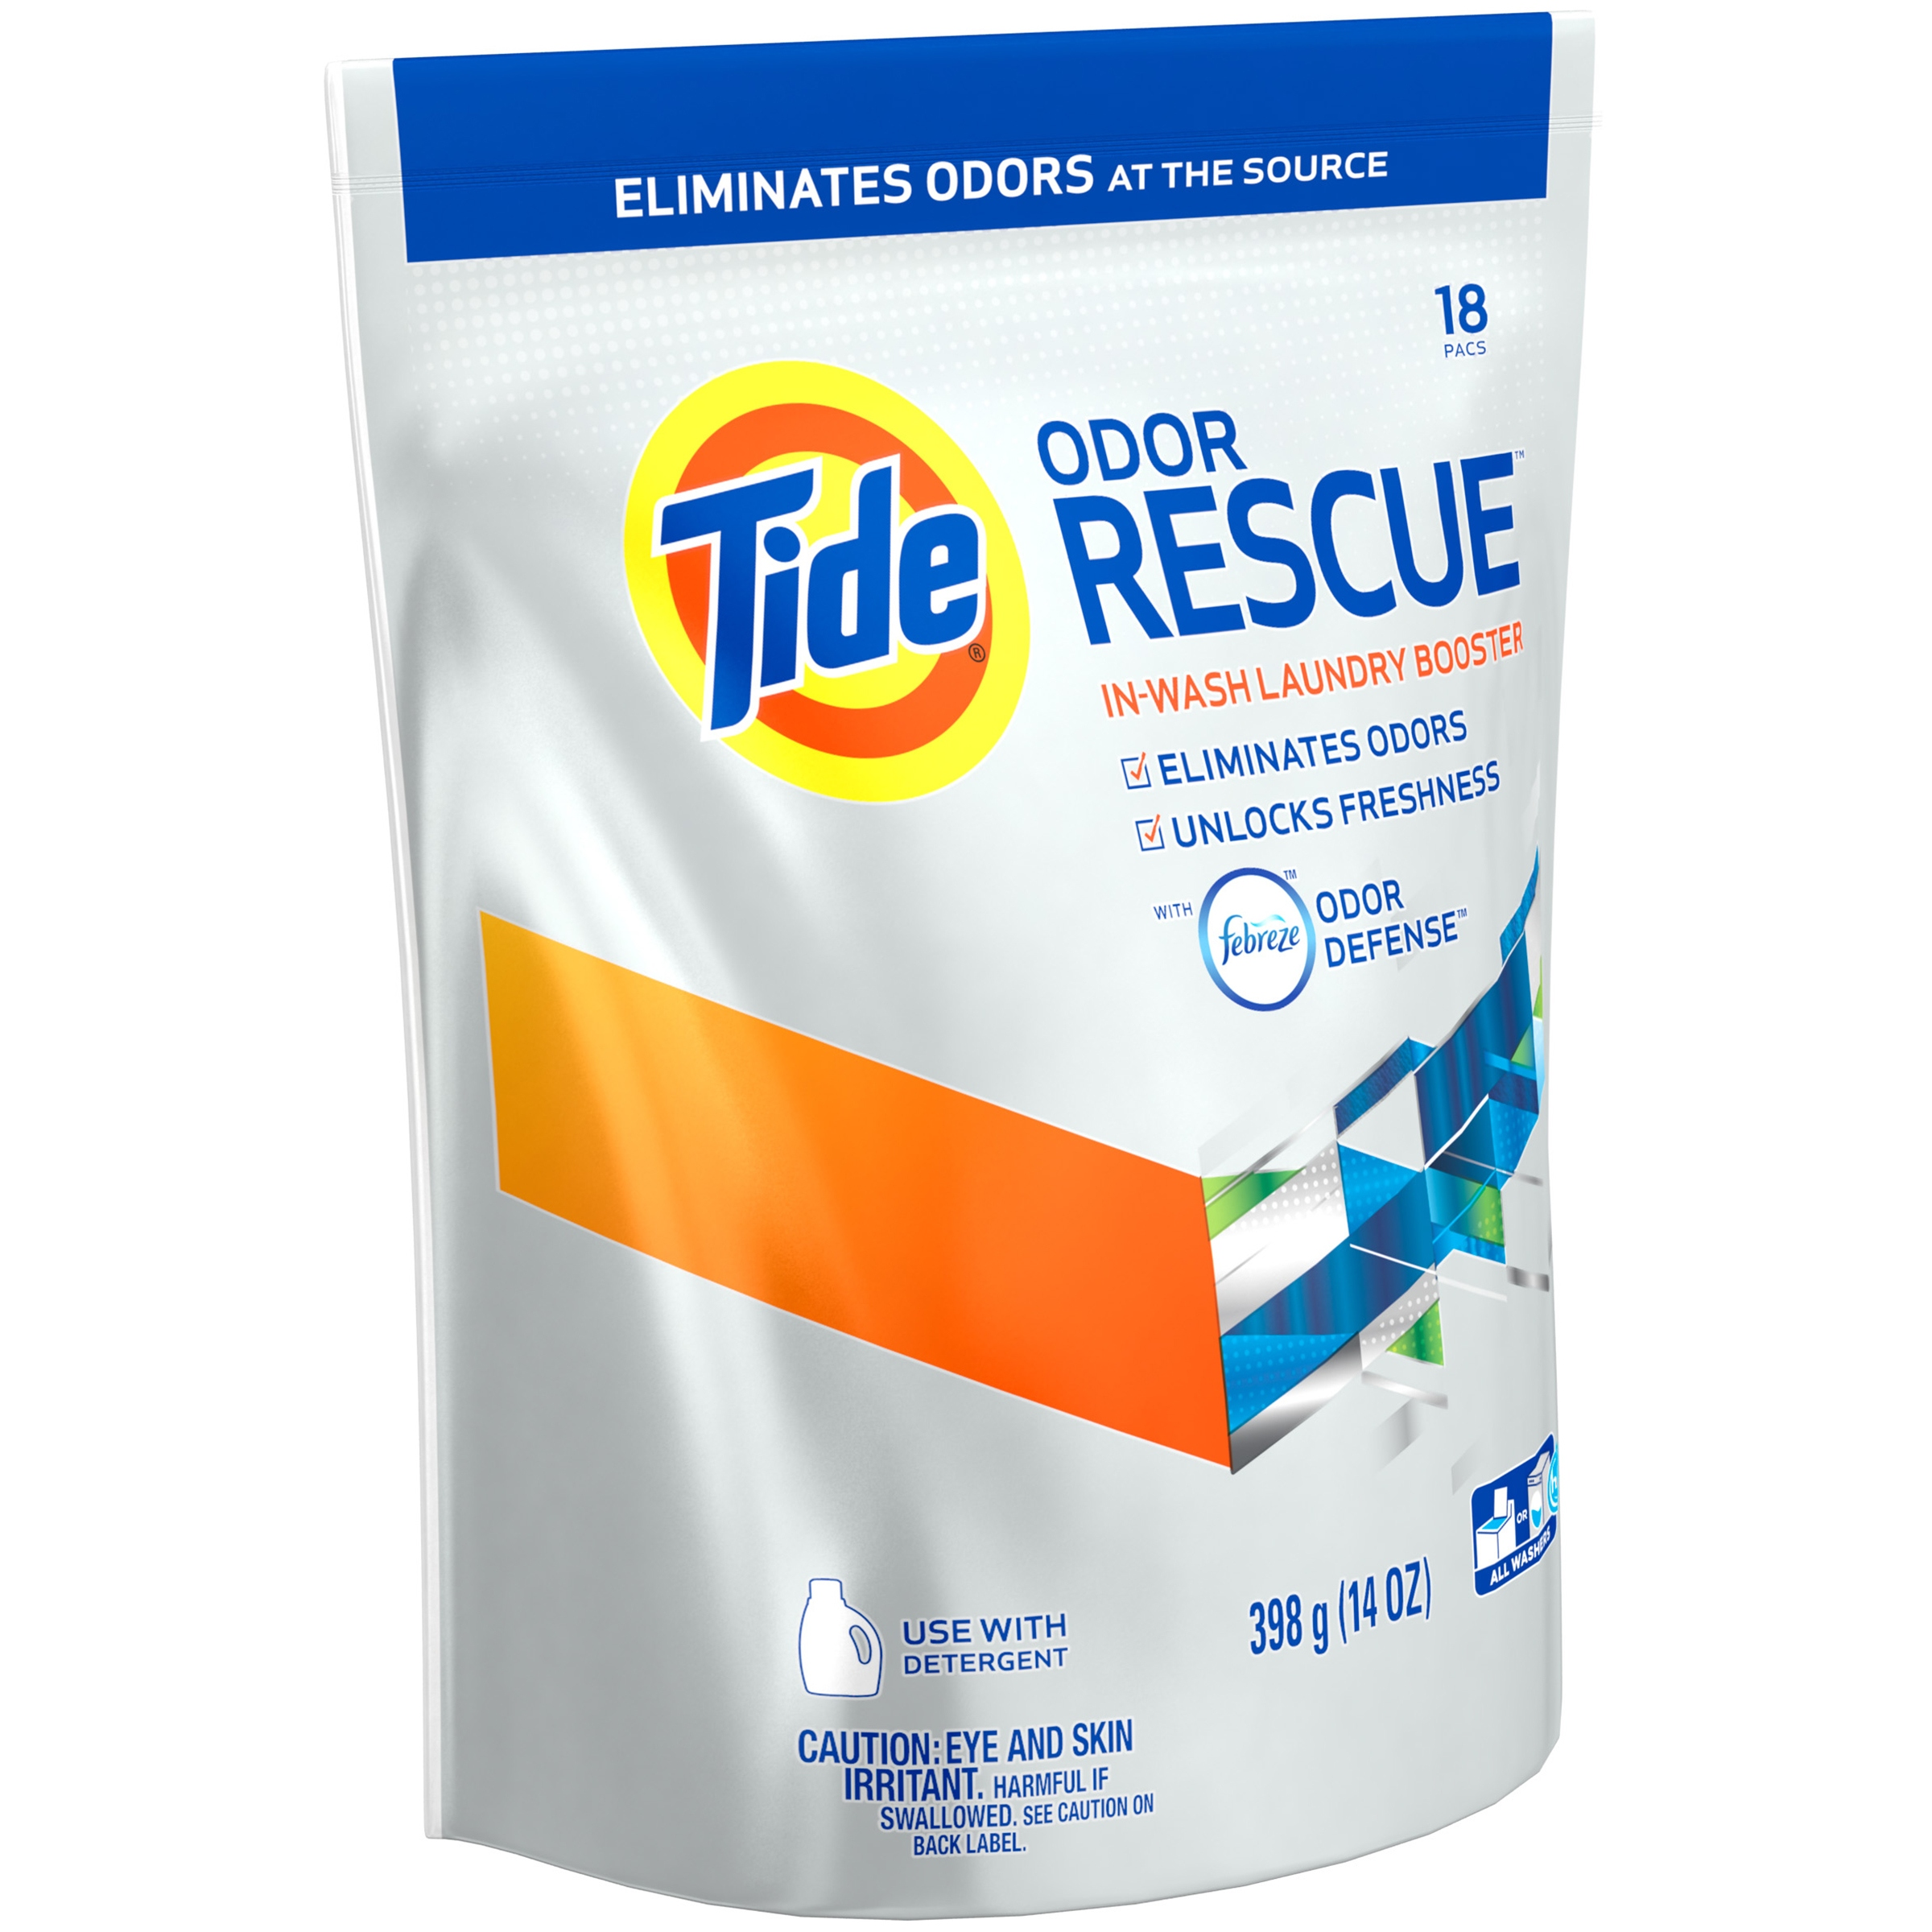 Tide Odor Rescue with Febreze Odor Defense In-Wash Laundry Scent Booster Pacs, 18 loads